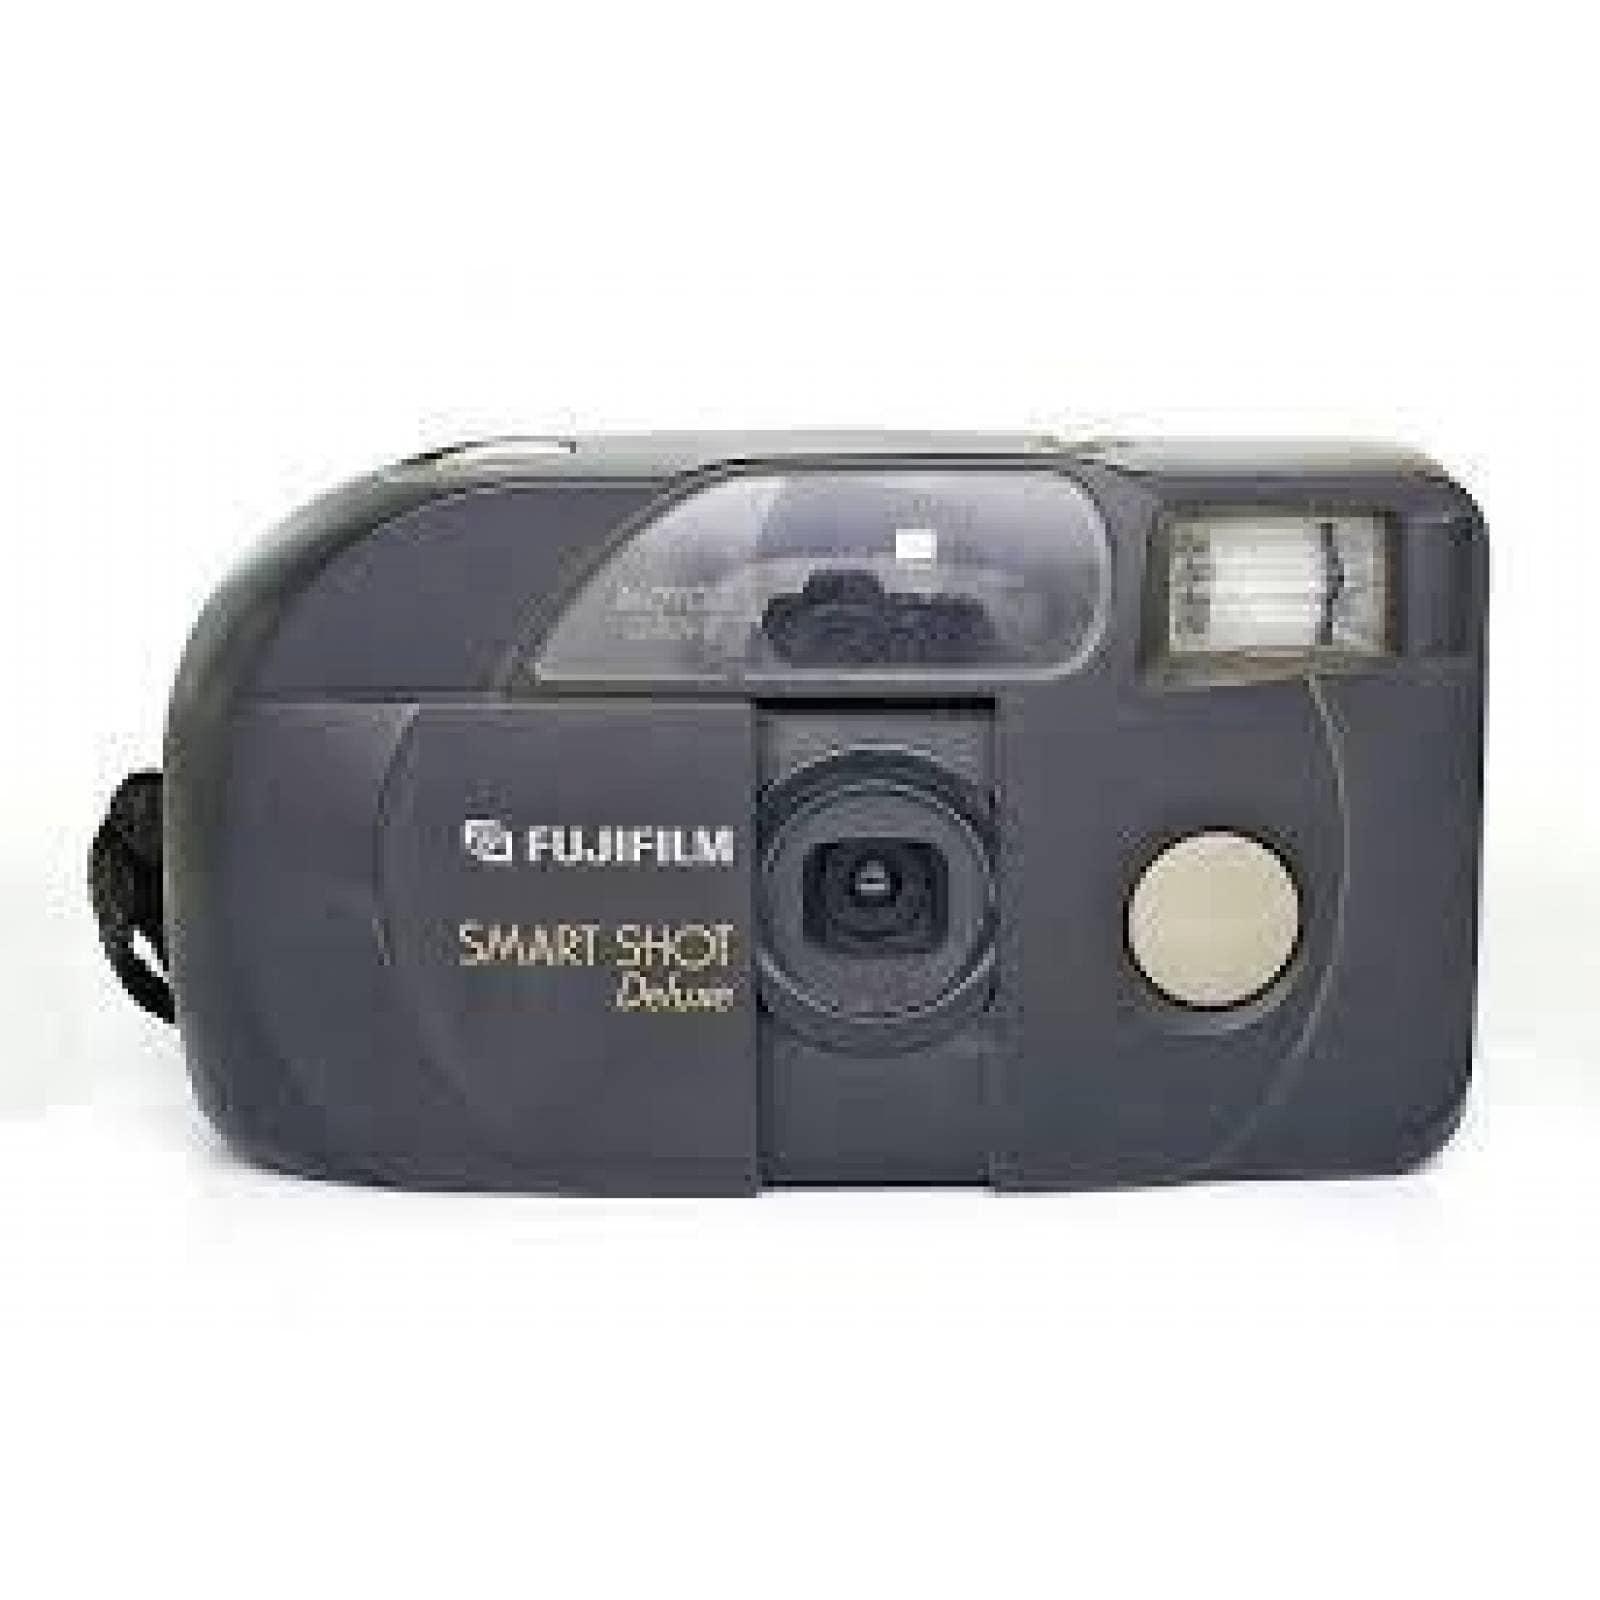 CAMARA FUJI SMART SHOT DELUXE 35MM